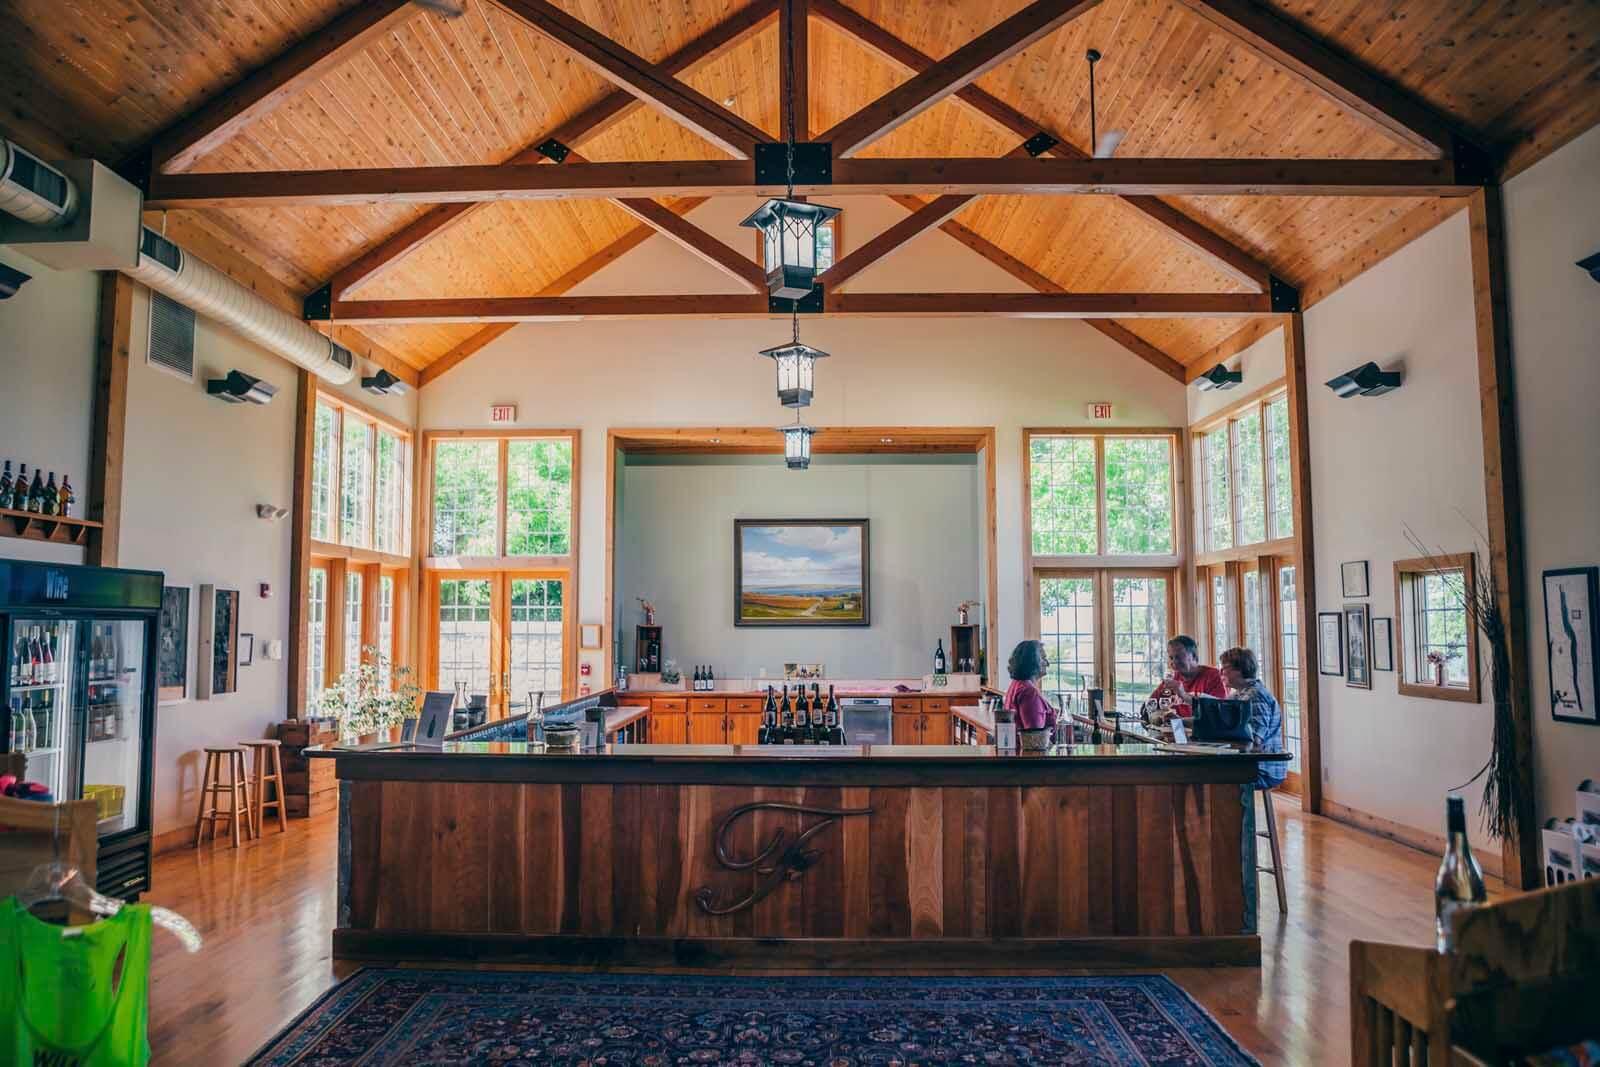 Tasting room at Fulkerson Vineyard on Seneca Wine Trail